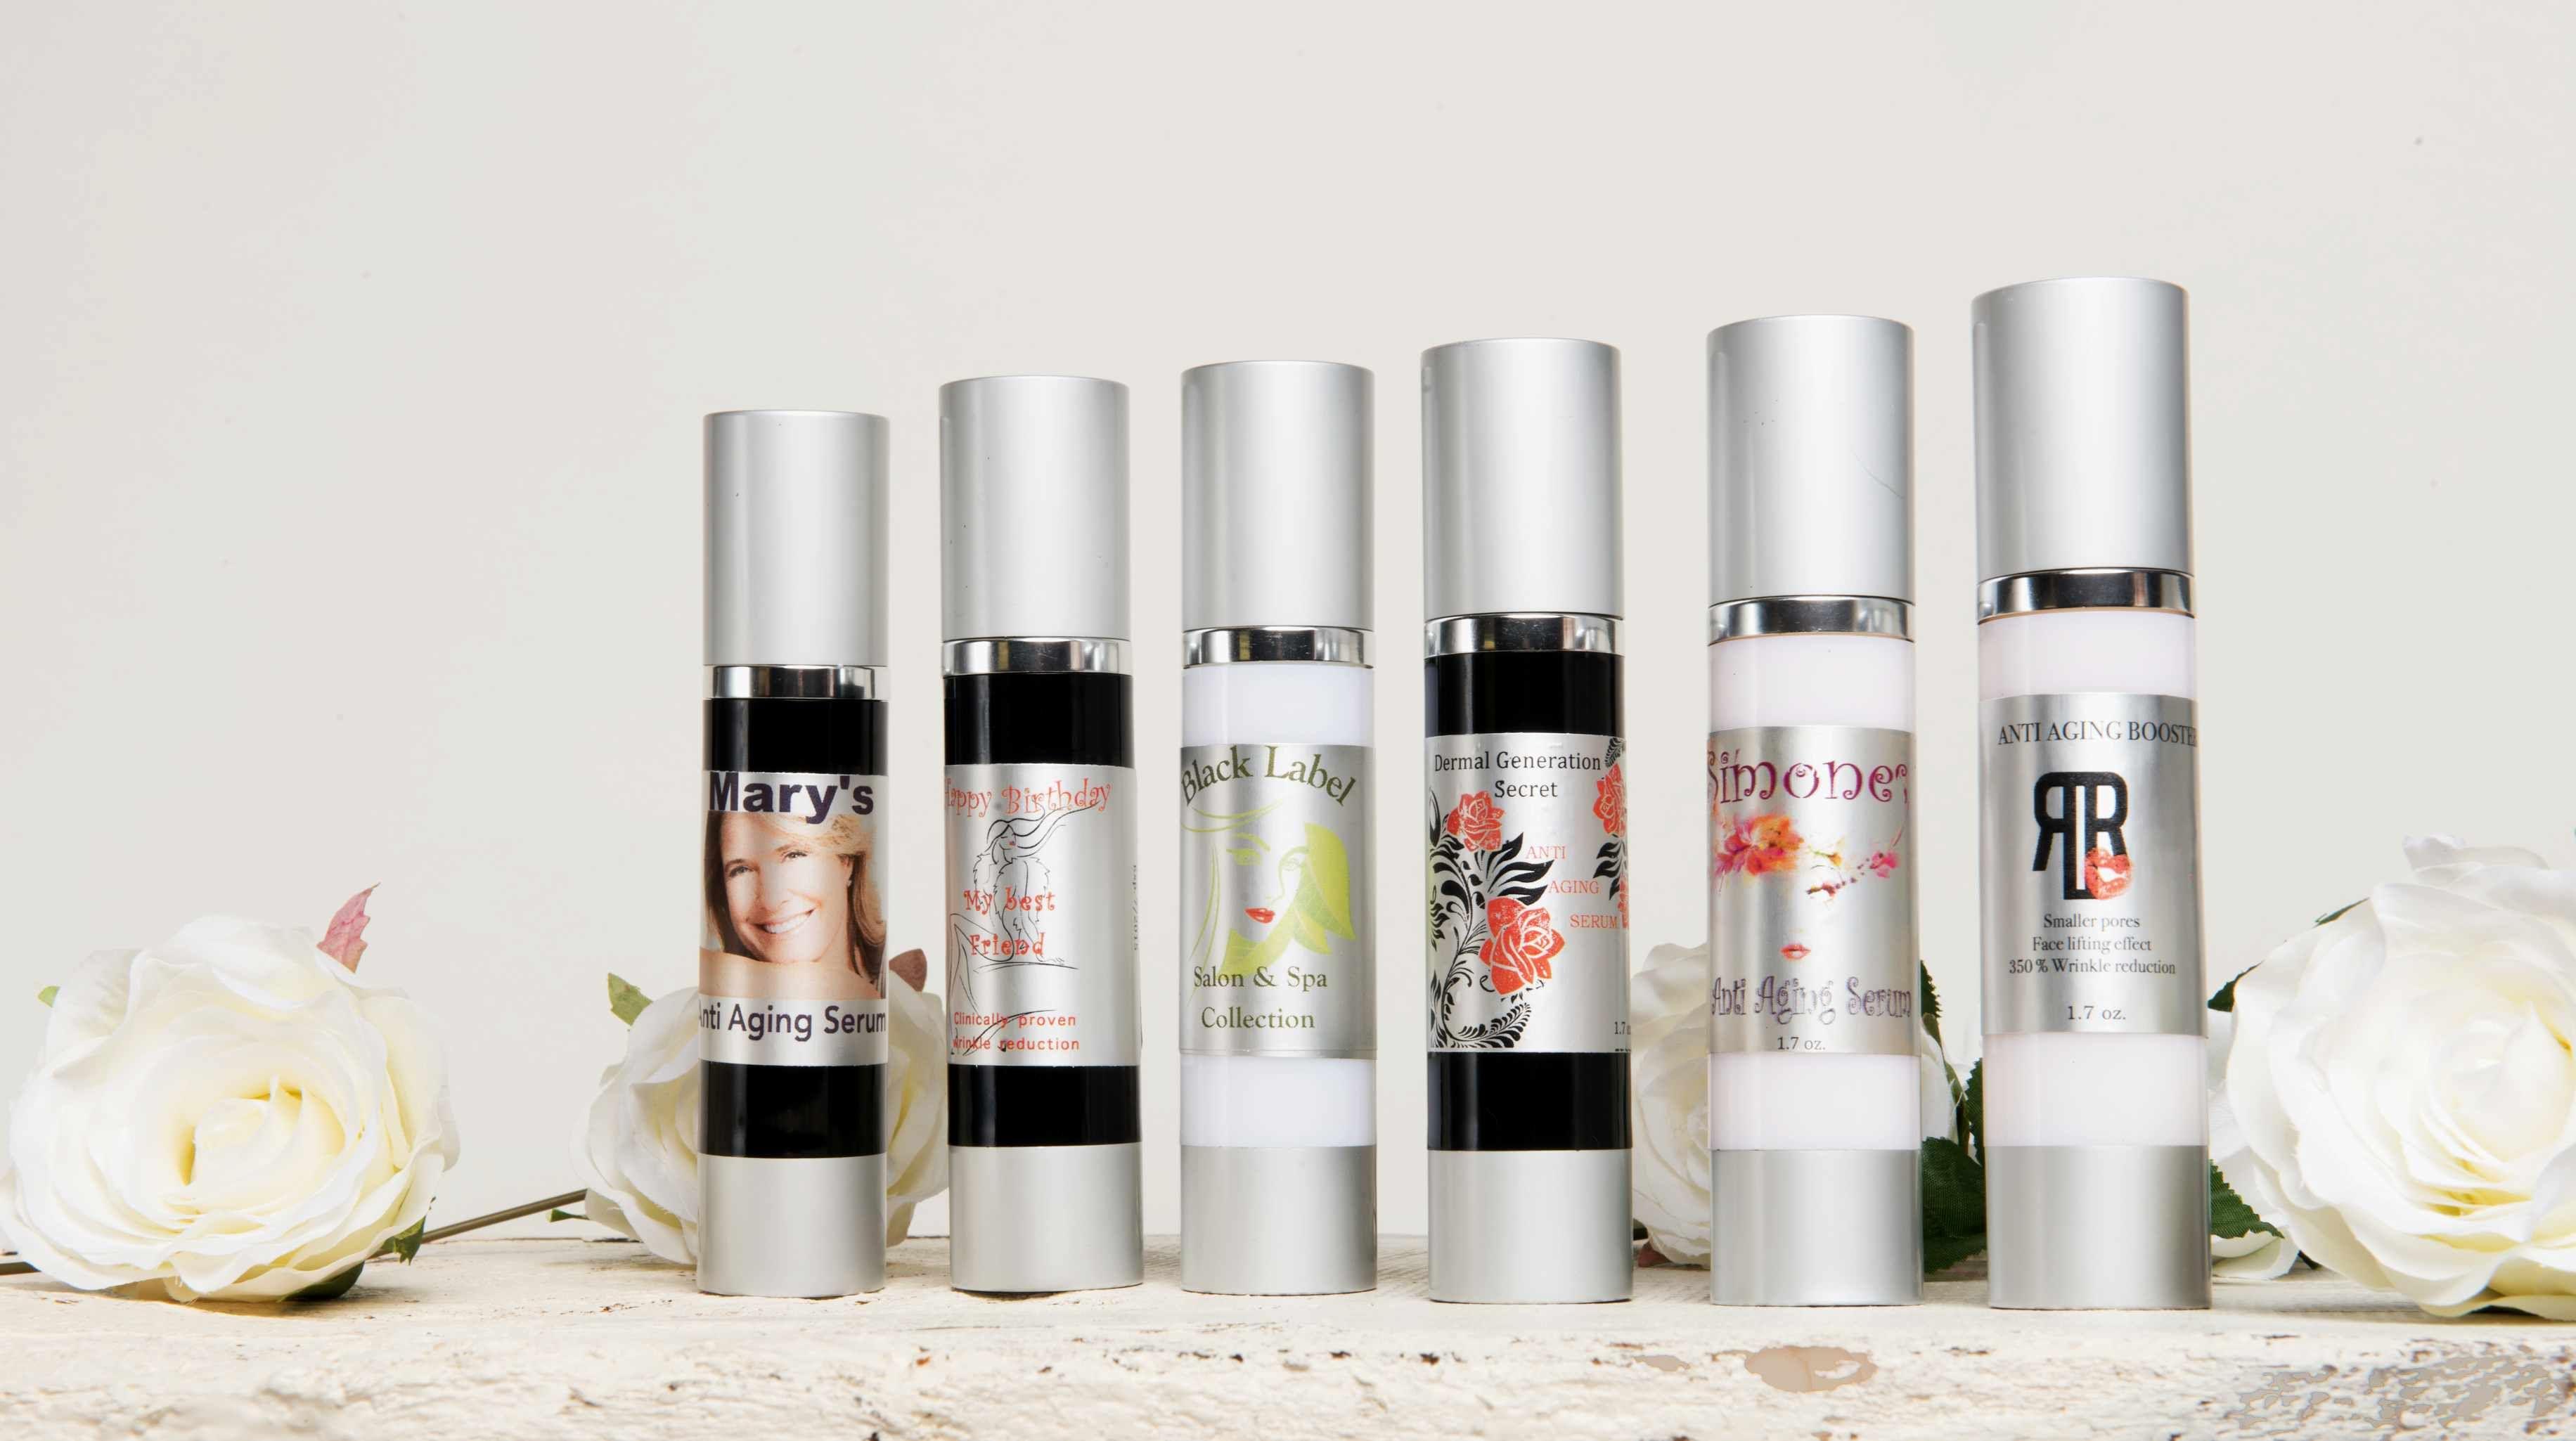 Private Label Serum Anti Aging Body Lotions Diy Cosmetics Serum